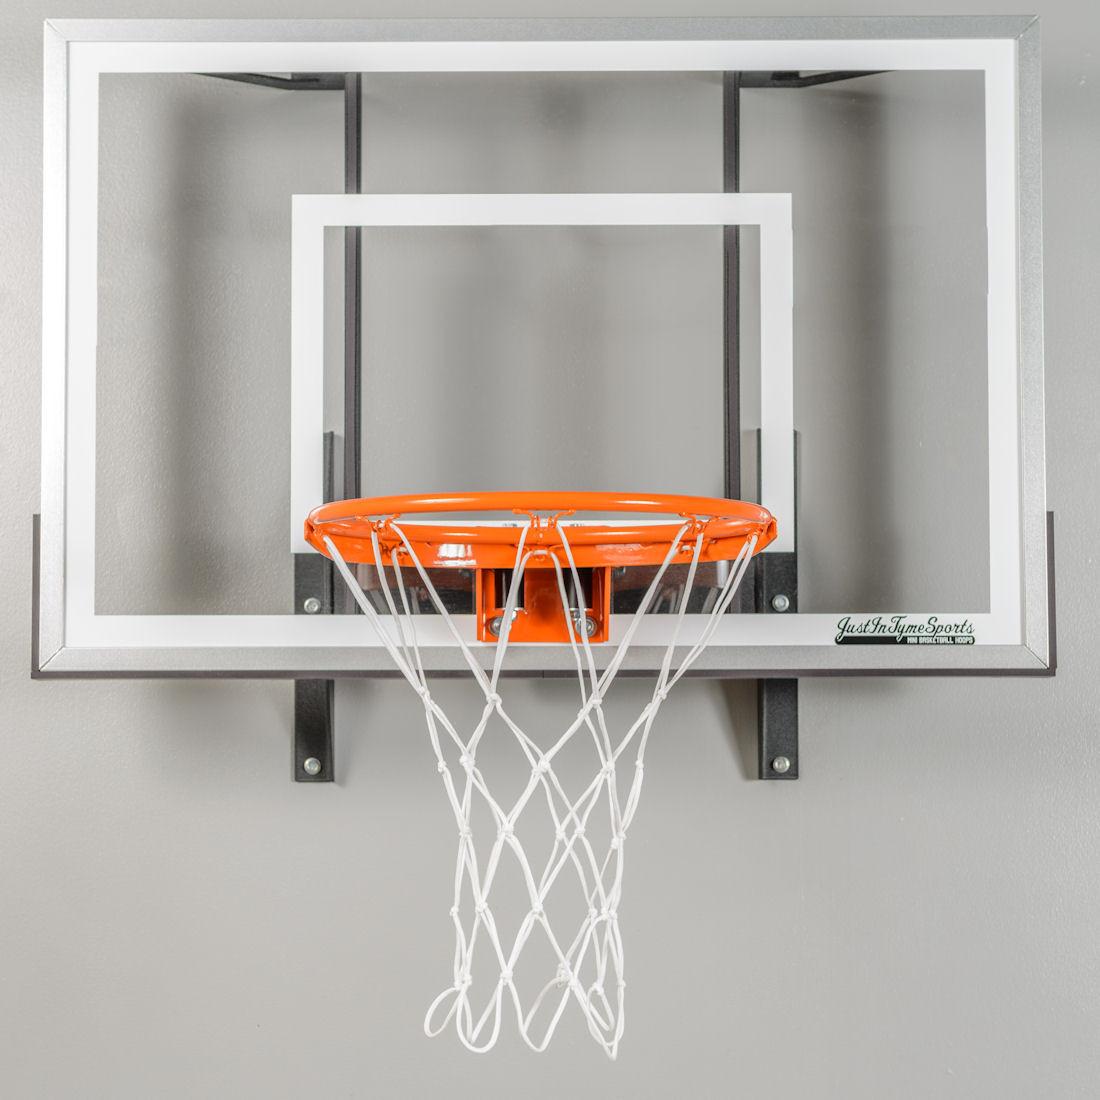 Wall Mounted Mini Basketball Hoops Justintymesports